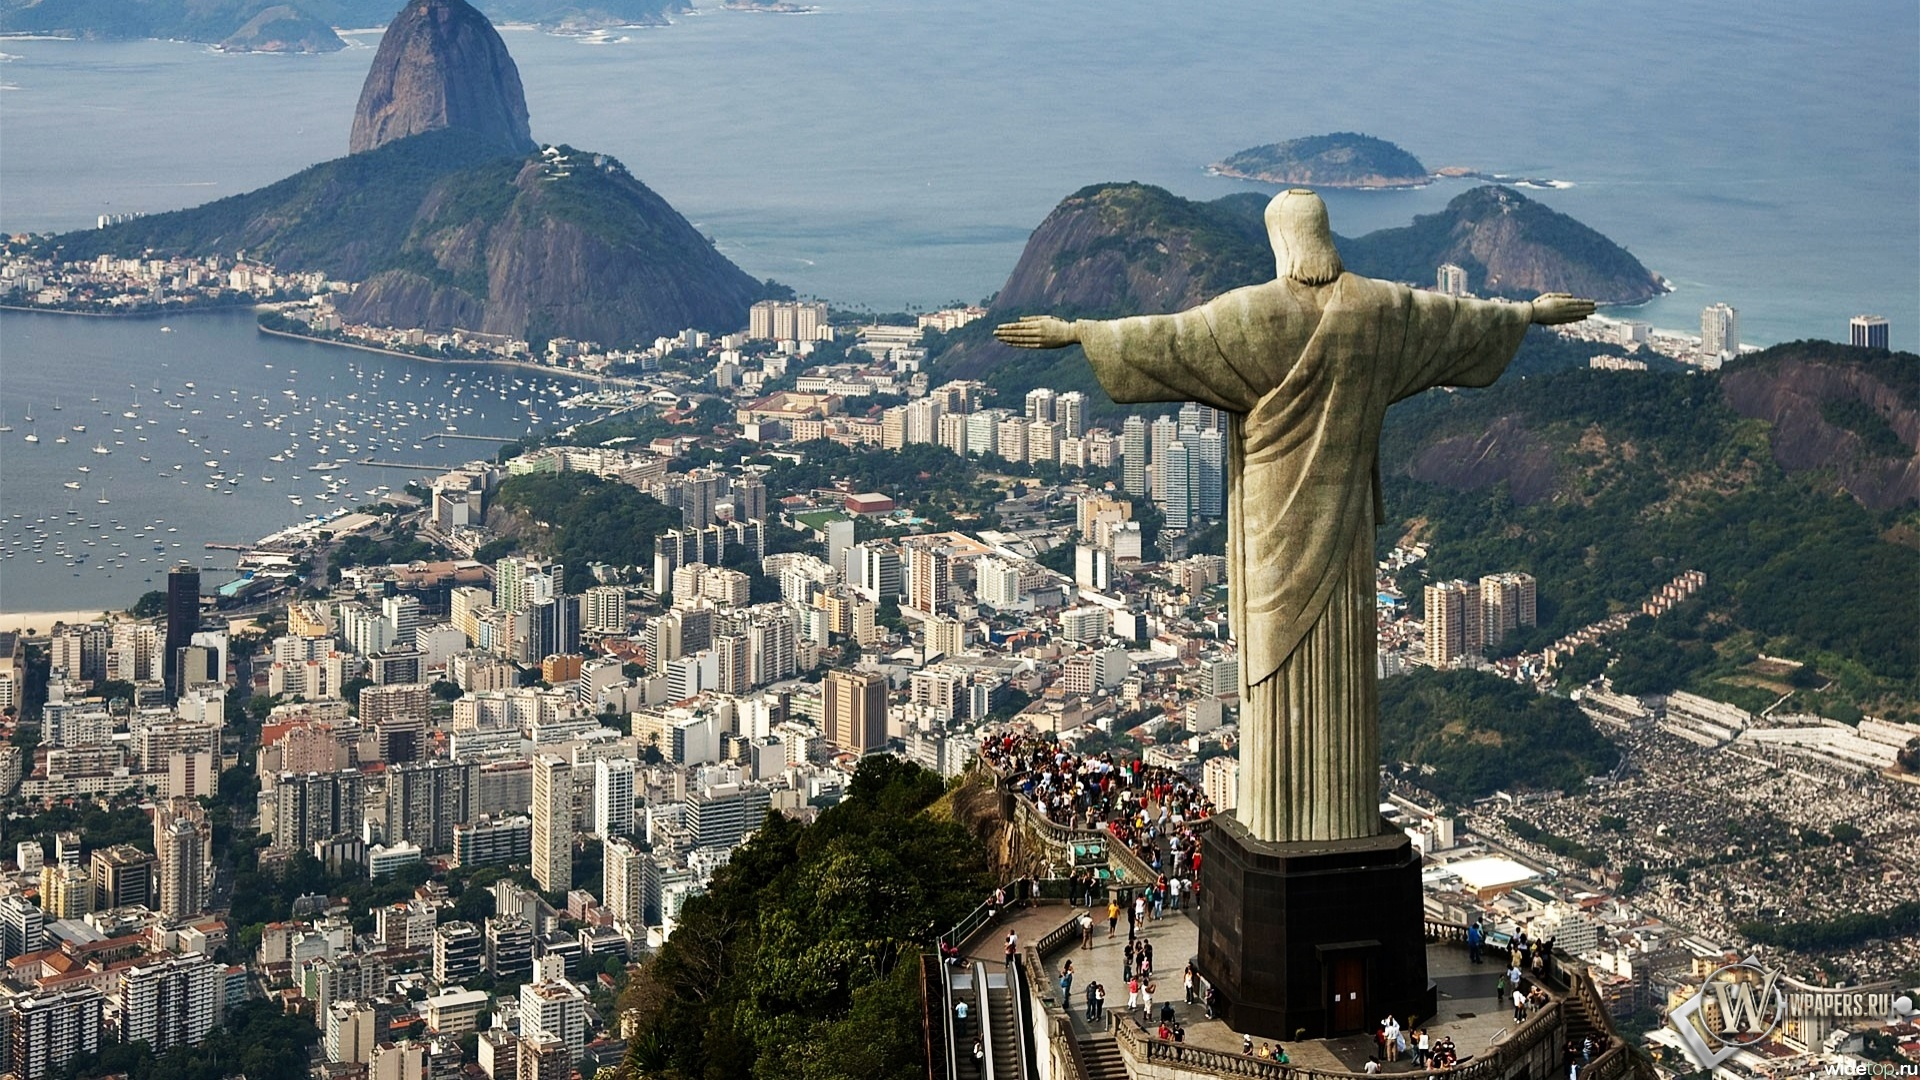 Статуя Христа в Бразилии 1920x1080